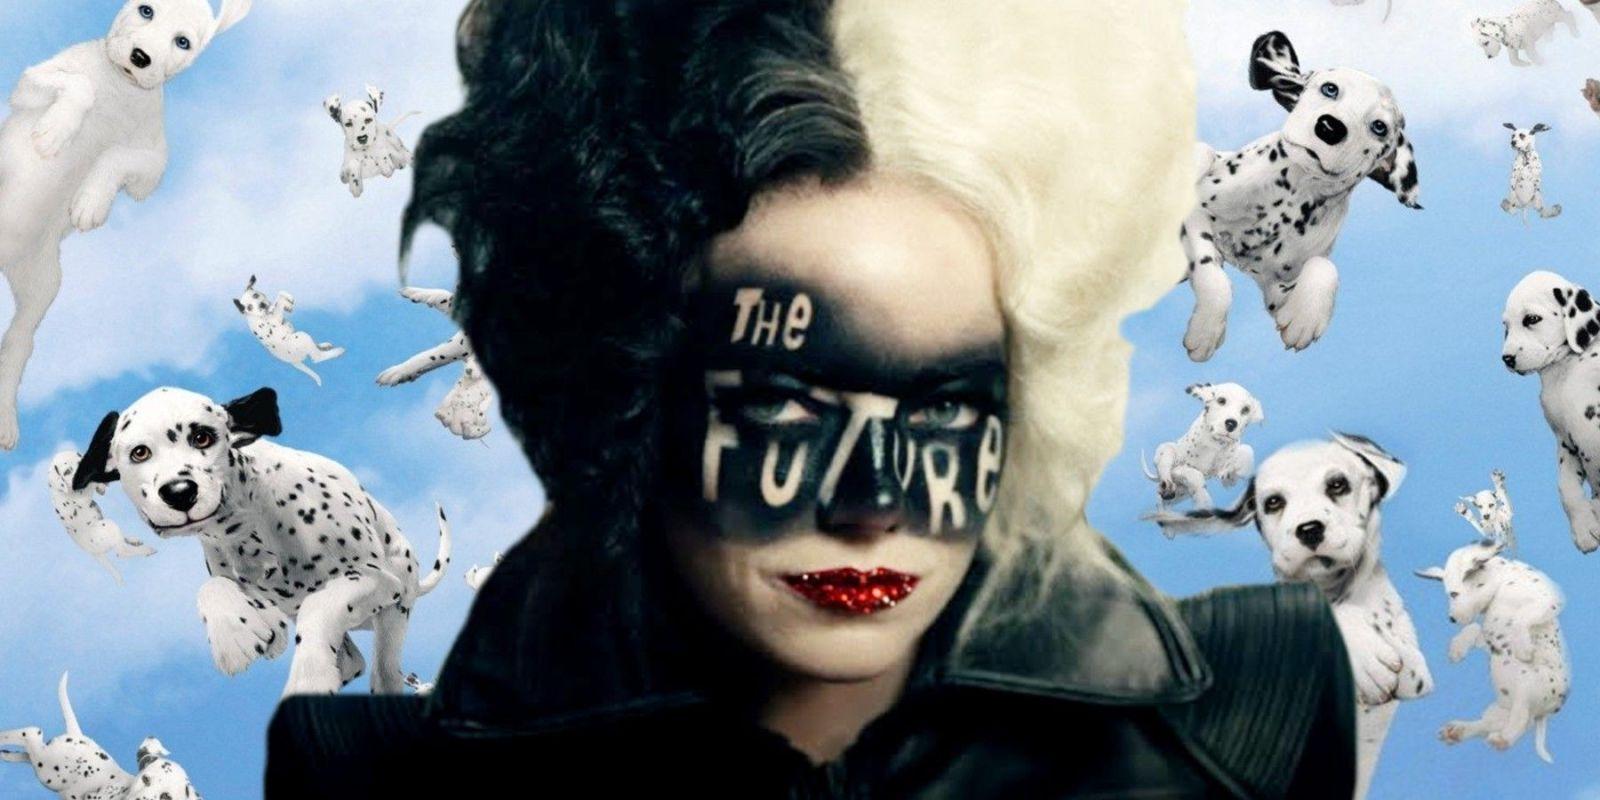 Disney is working on Emma Stone's Cruella Sequel